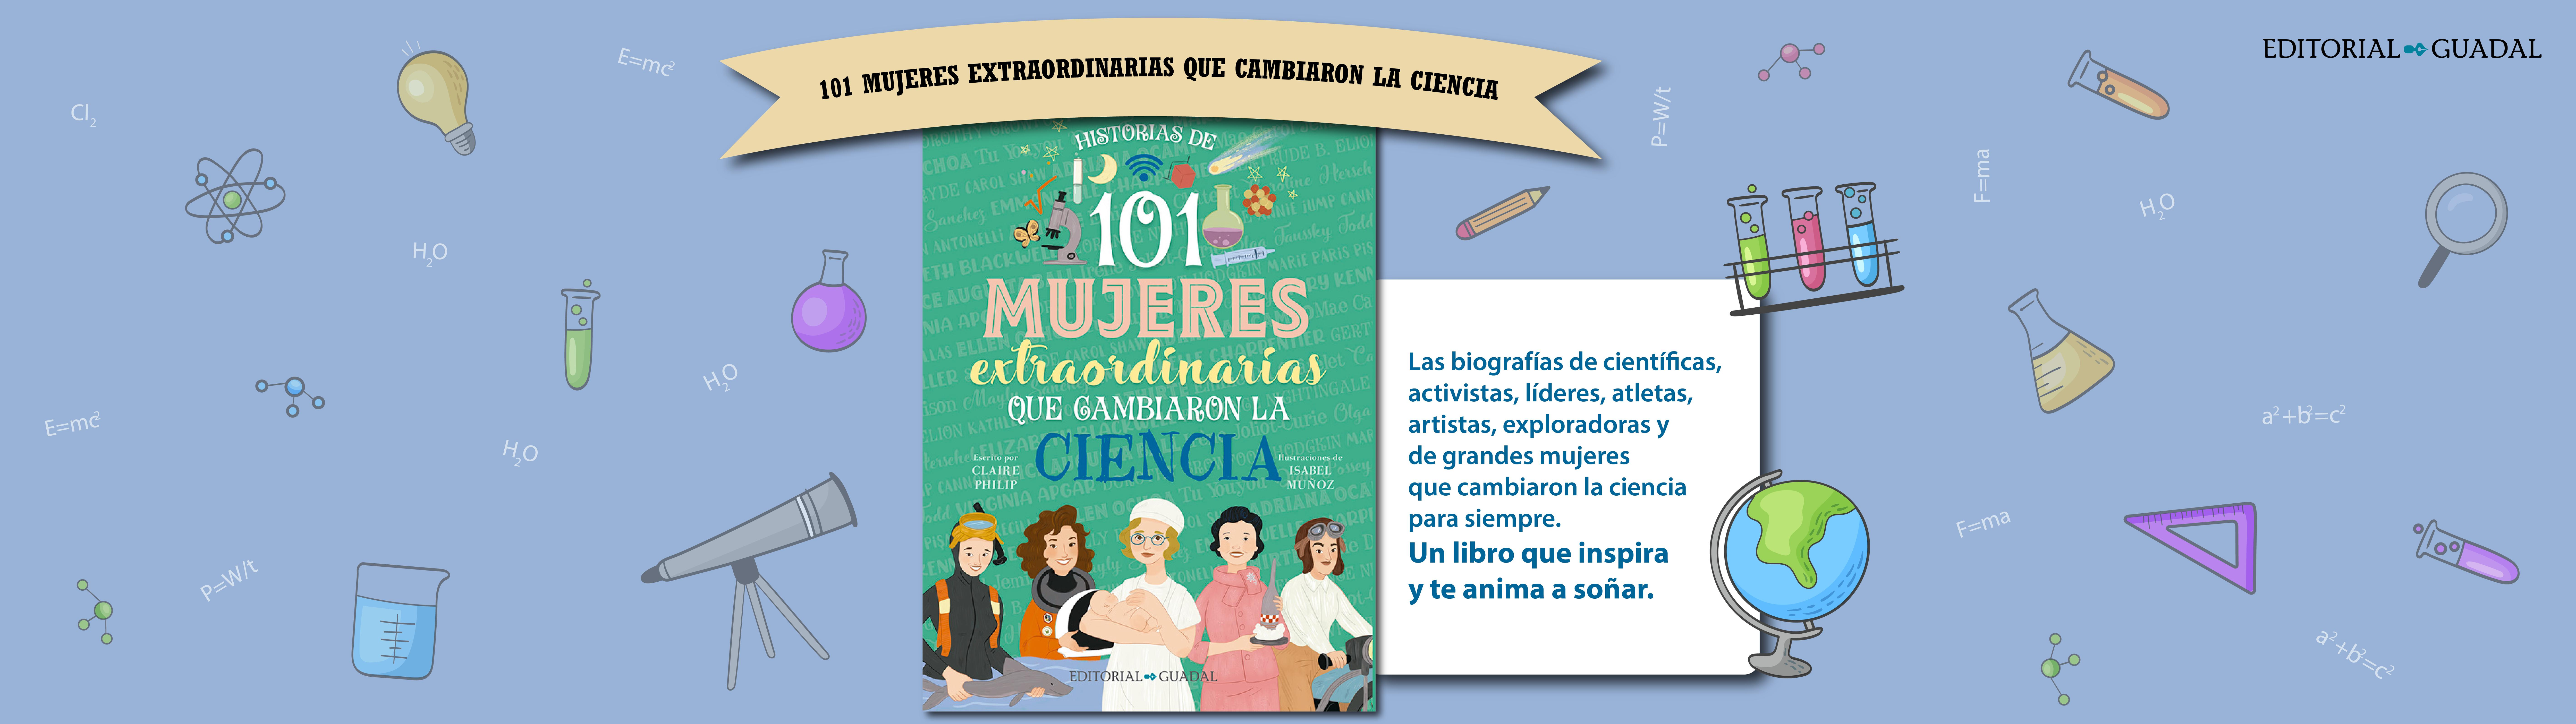 101 Mujeres ciencia_WEB_1920x540